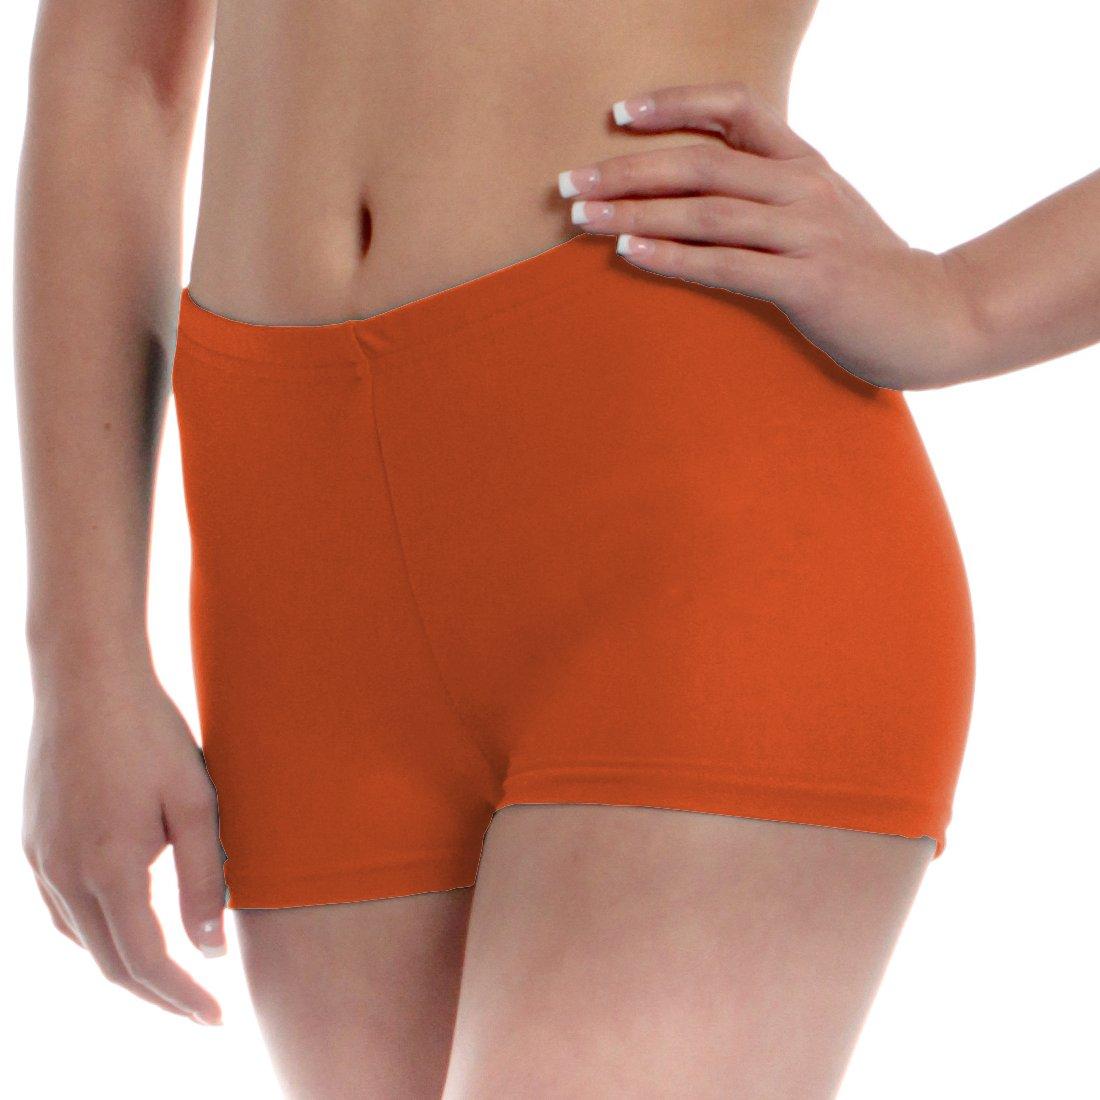 Mens Long Dance Shorts Medium Orange by B Dancewear Adult Sizes by Bailar Dancewear